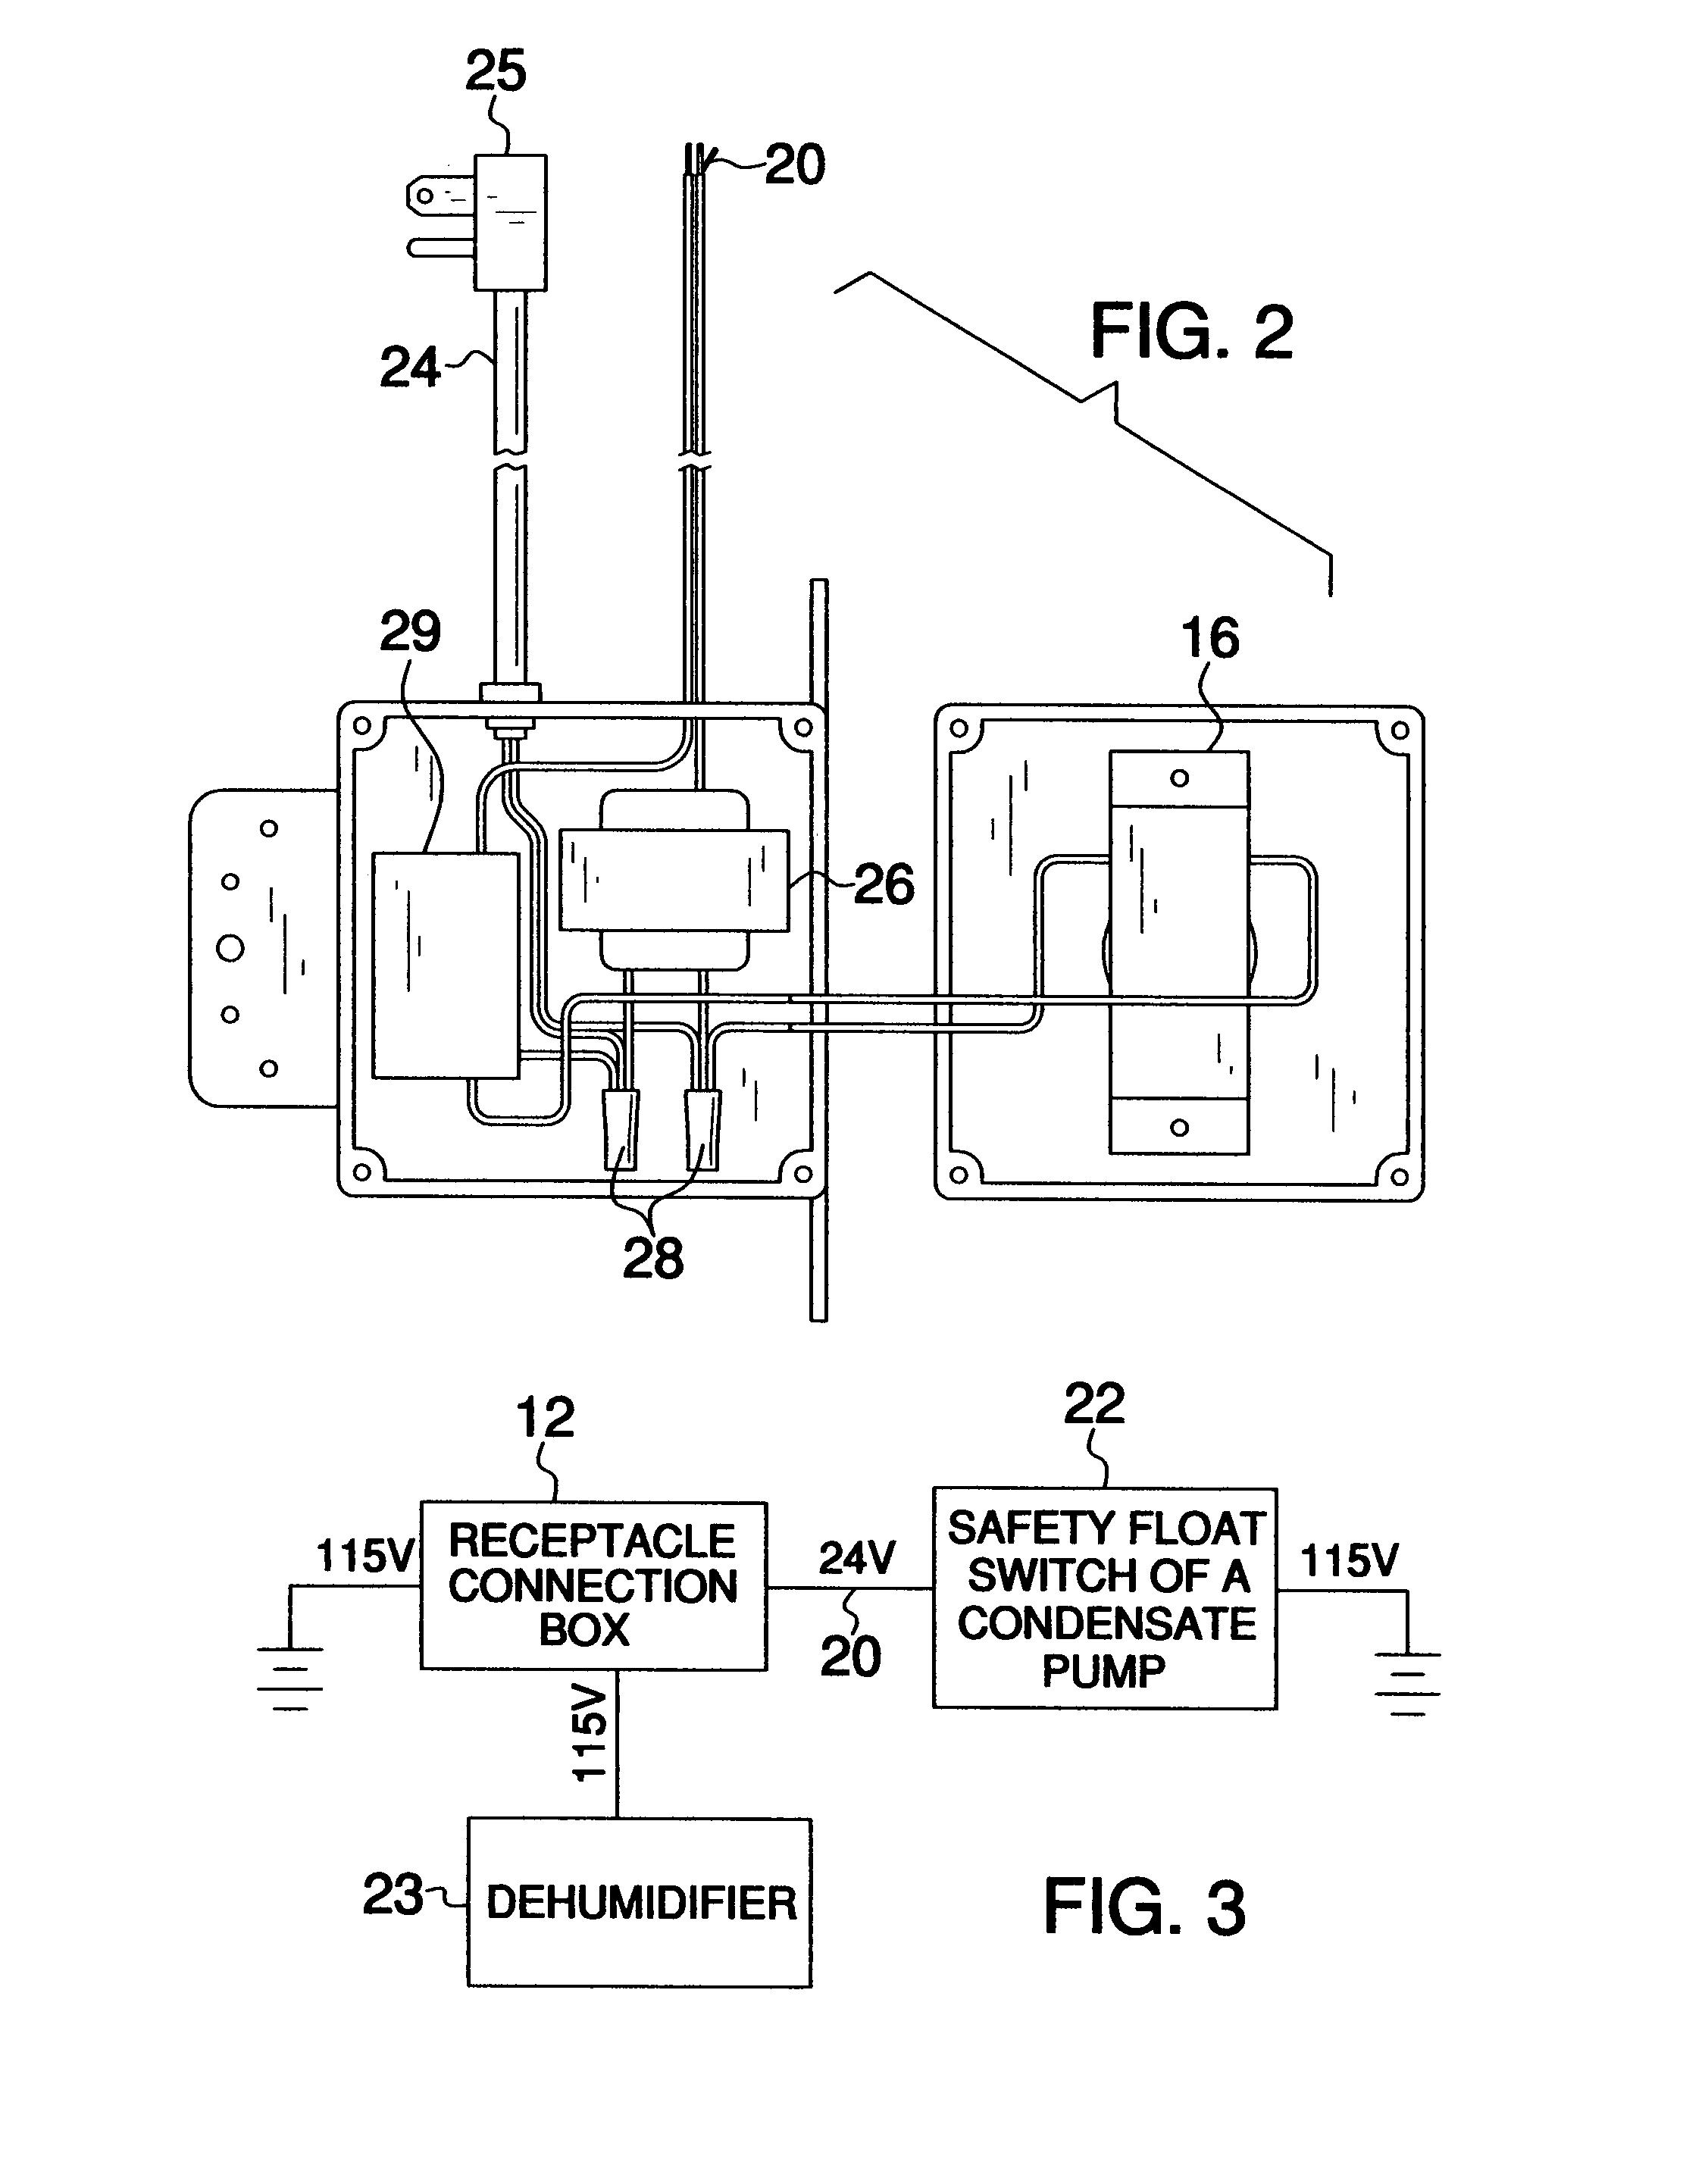 condensate pump wiring diagram